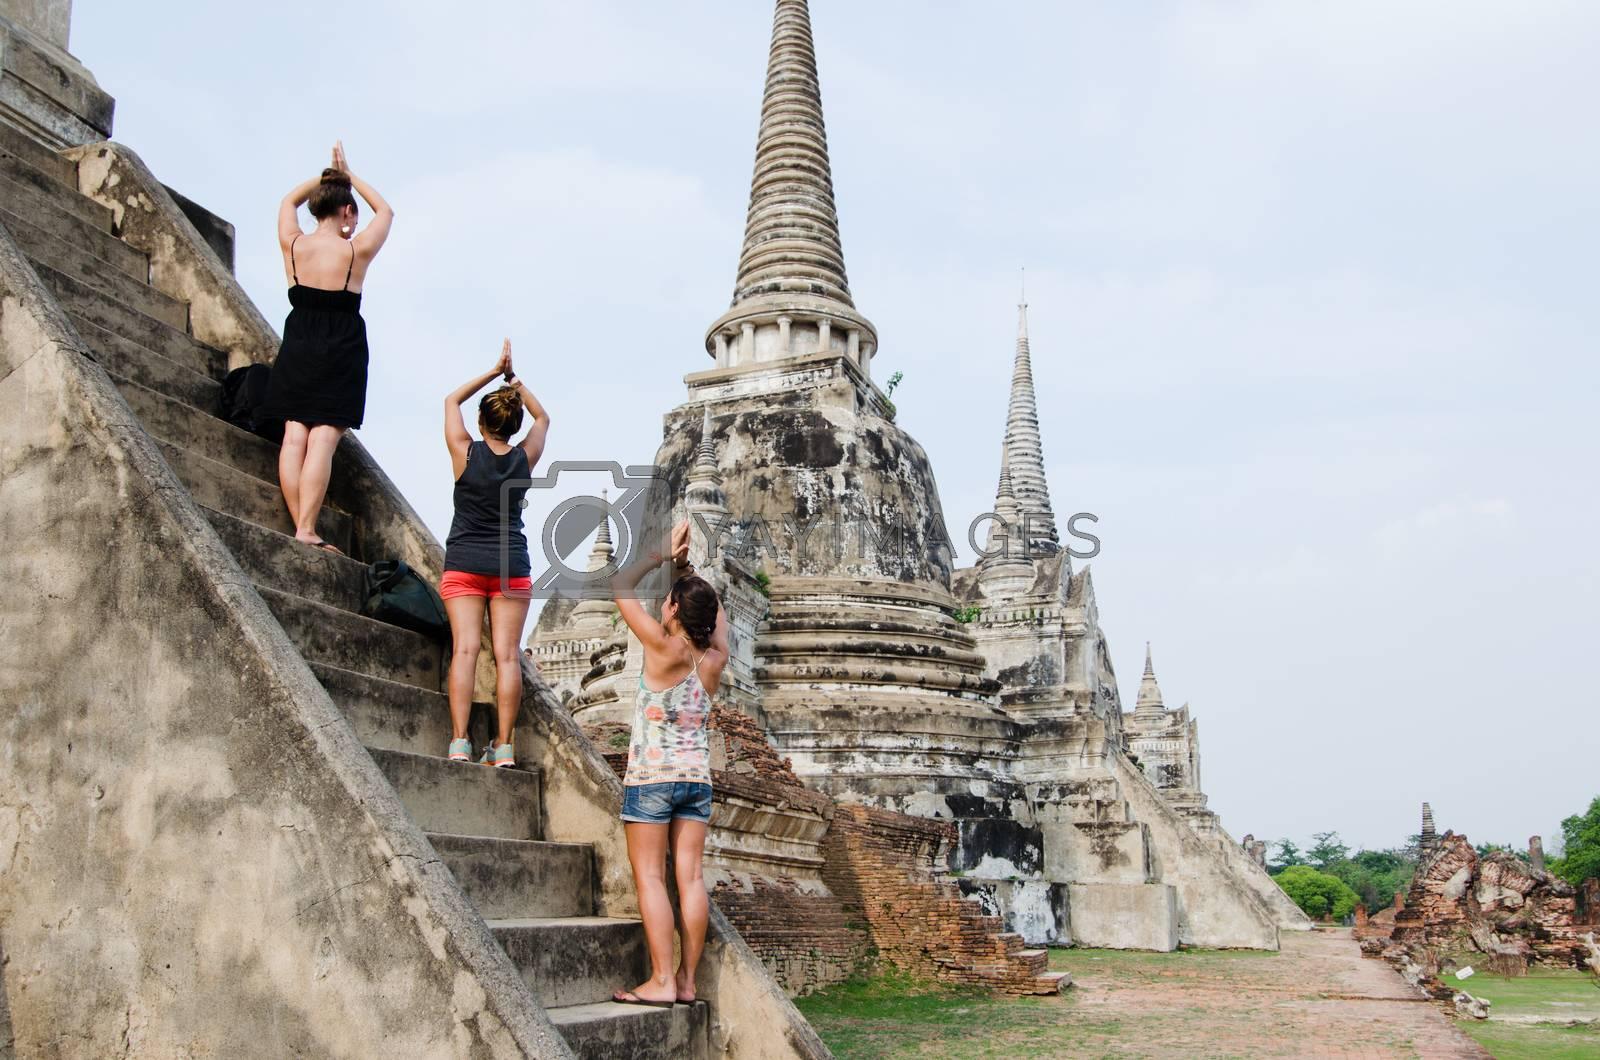 Ayutthaya, Thailand - 29 Apr 2014: Three female tourists mimic a yoga pose, aligned on the stone steps of Wat Pra Si Sanphet Buddhist shrine stupas in Ayutthaya, Thailand